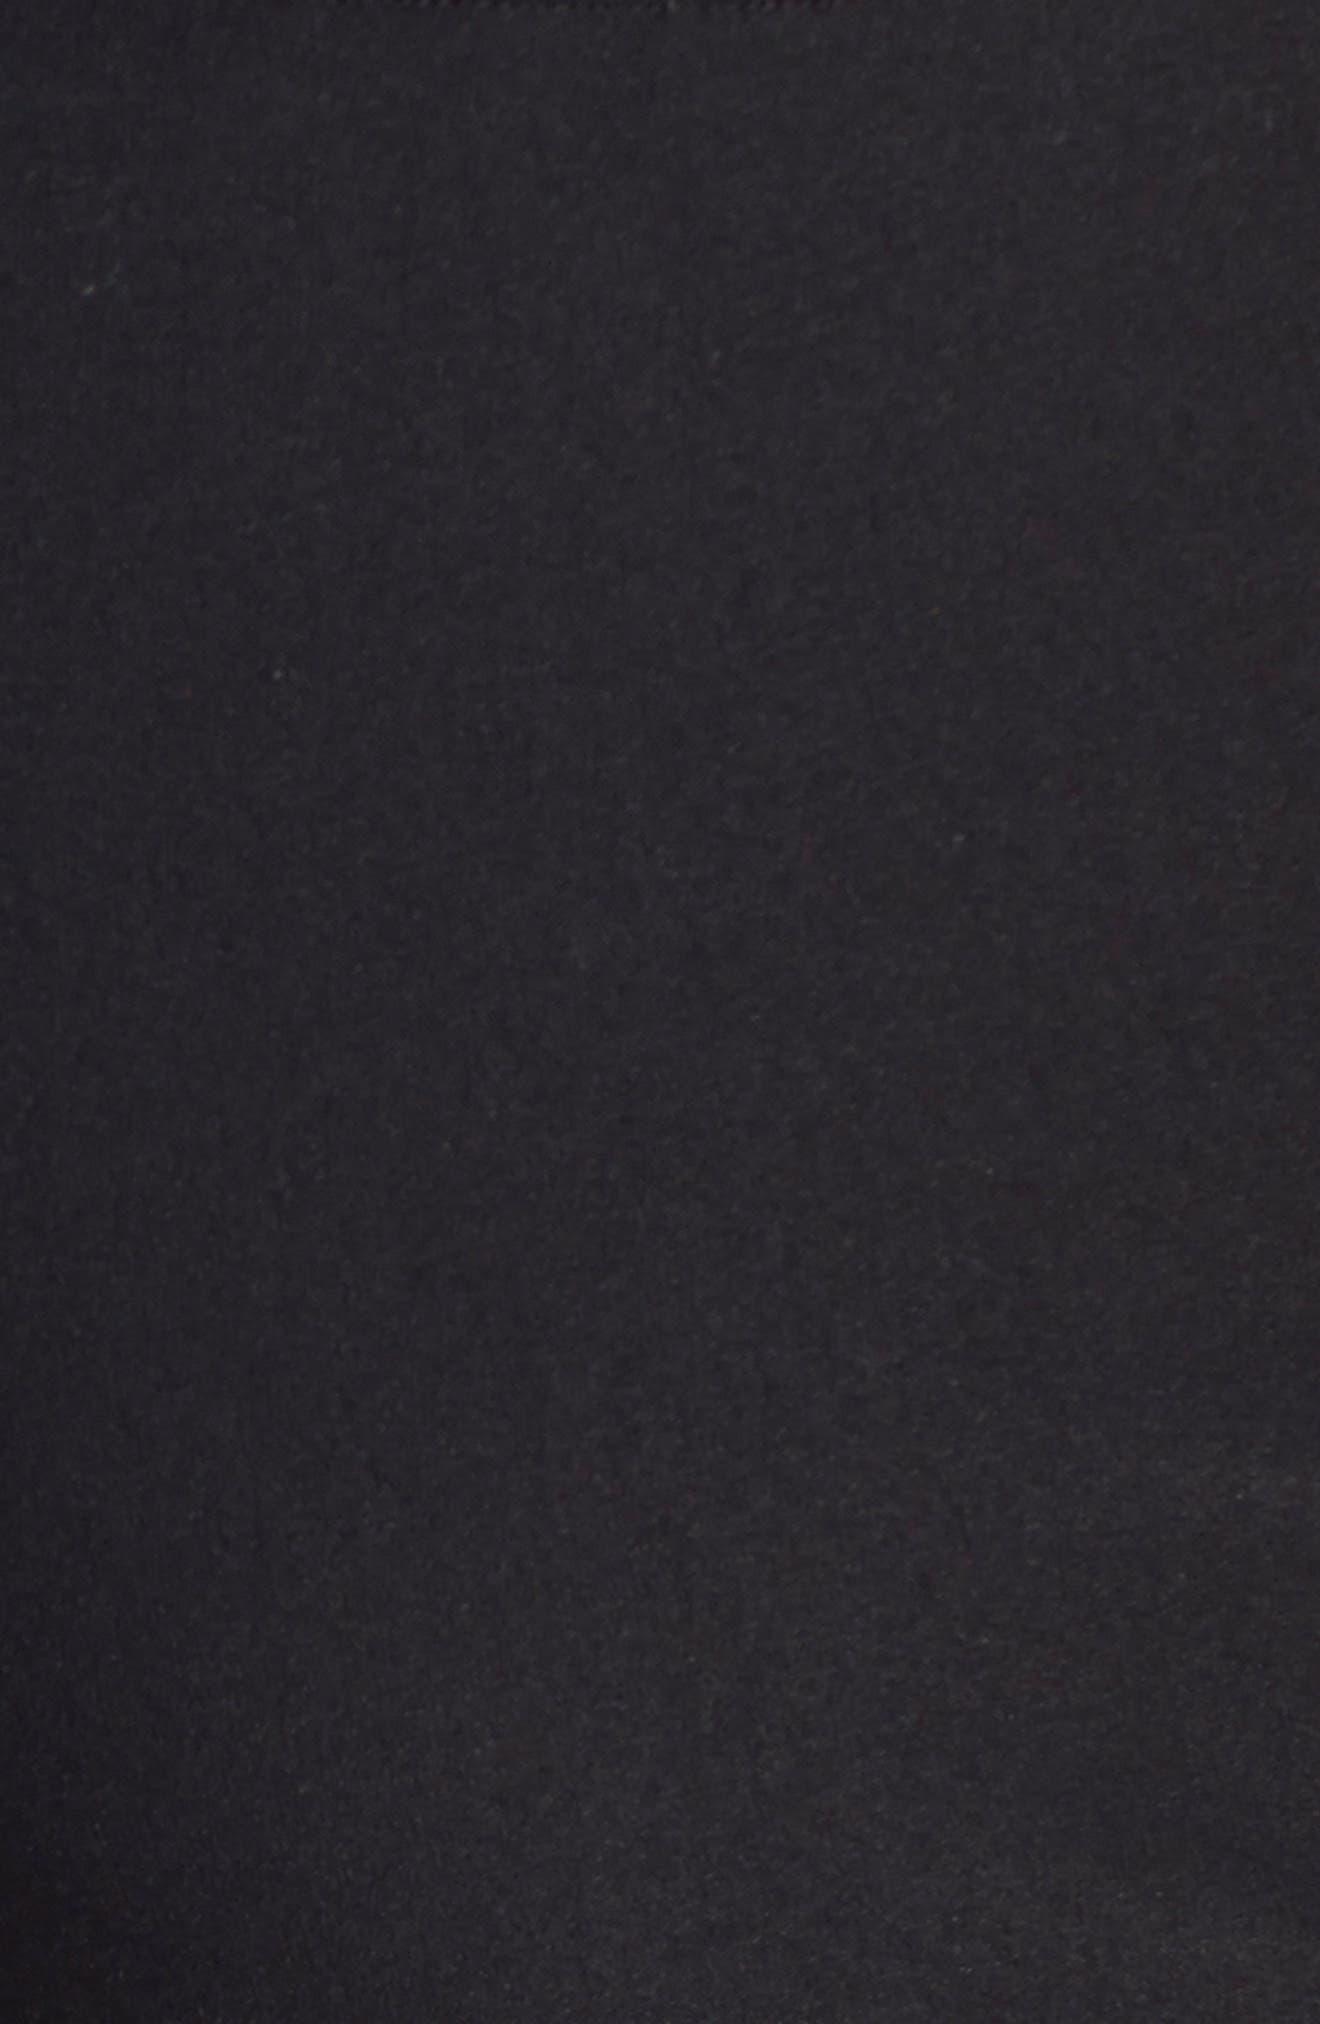 'Wonder Stretch' High Rise Straight Leg Pants,                             Alternate thumbnail 6, color,                             BLACK ONYX